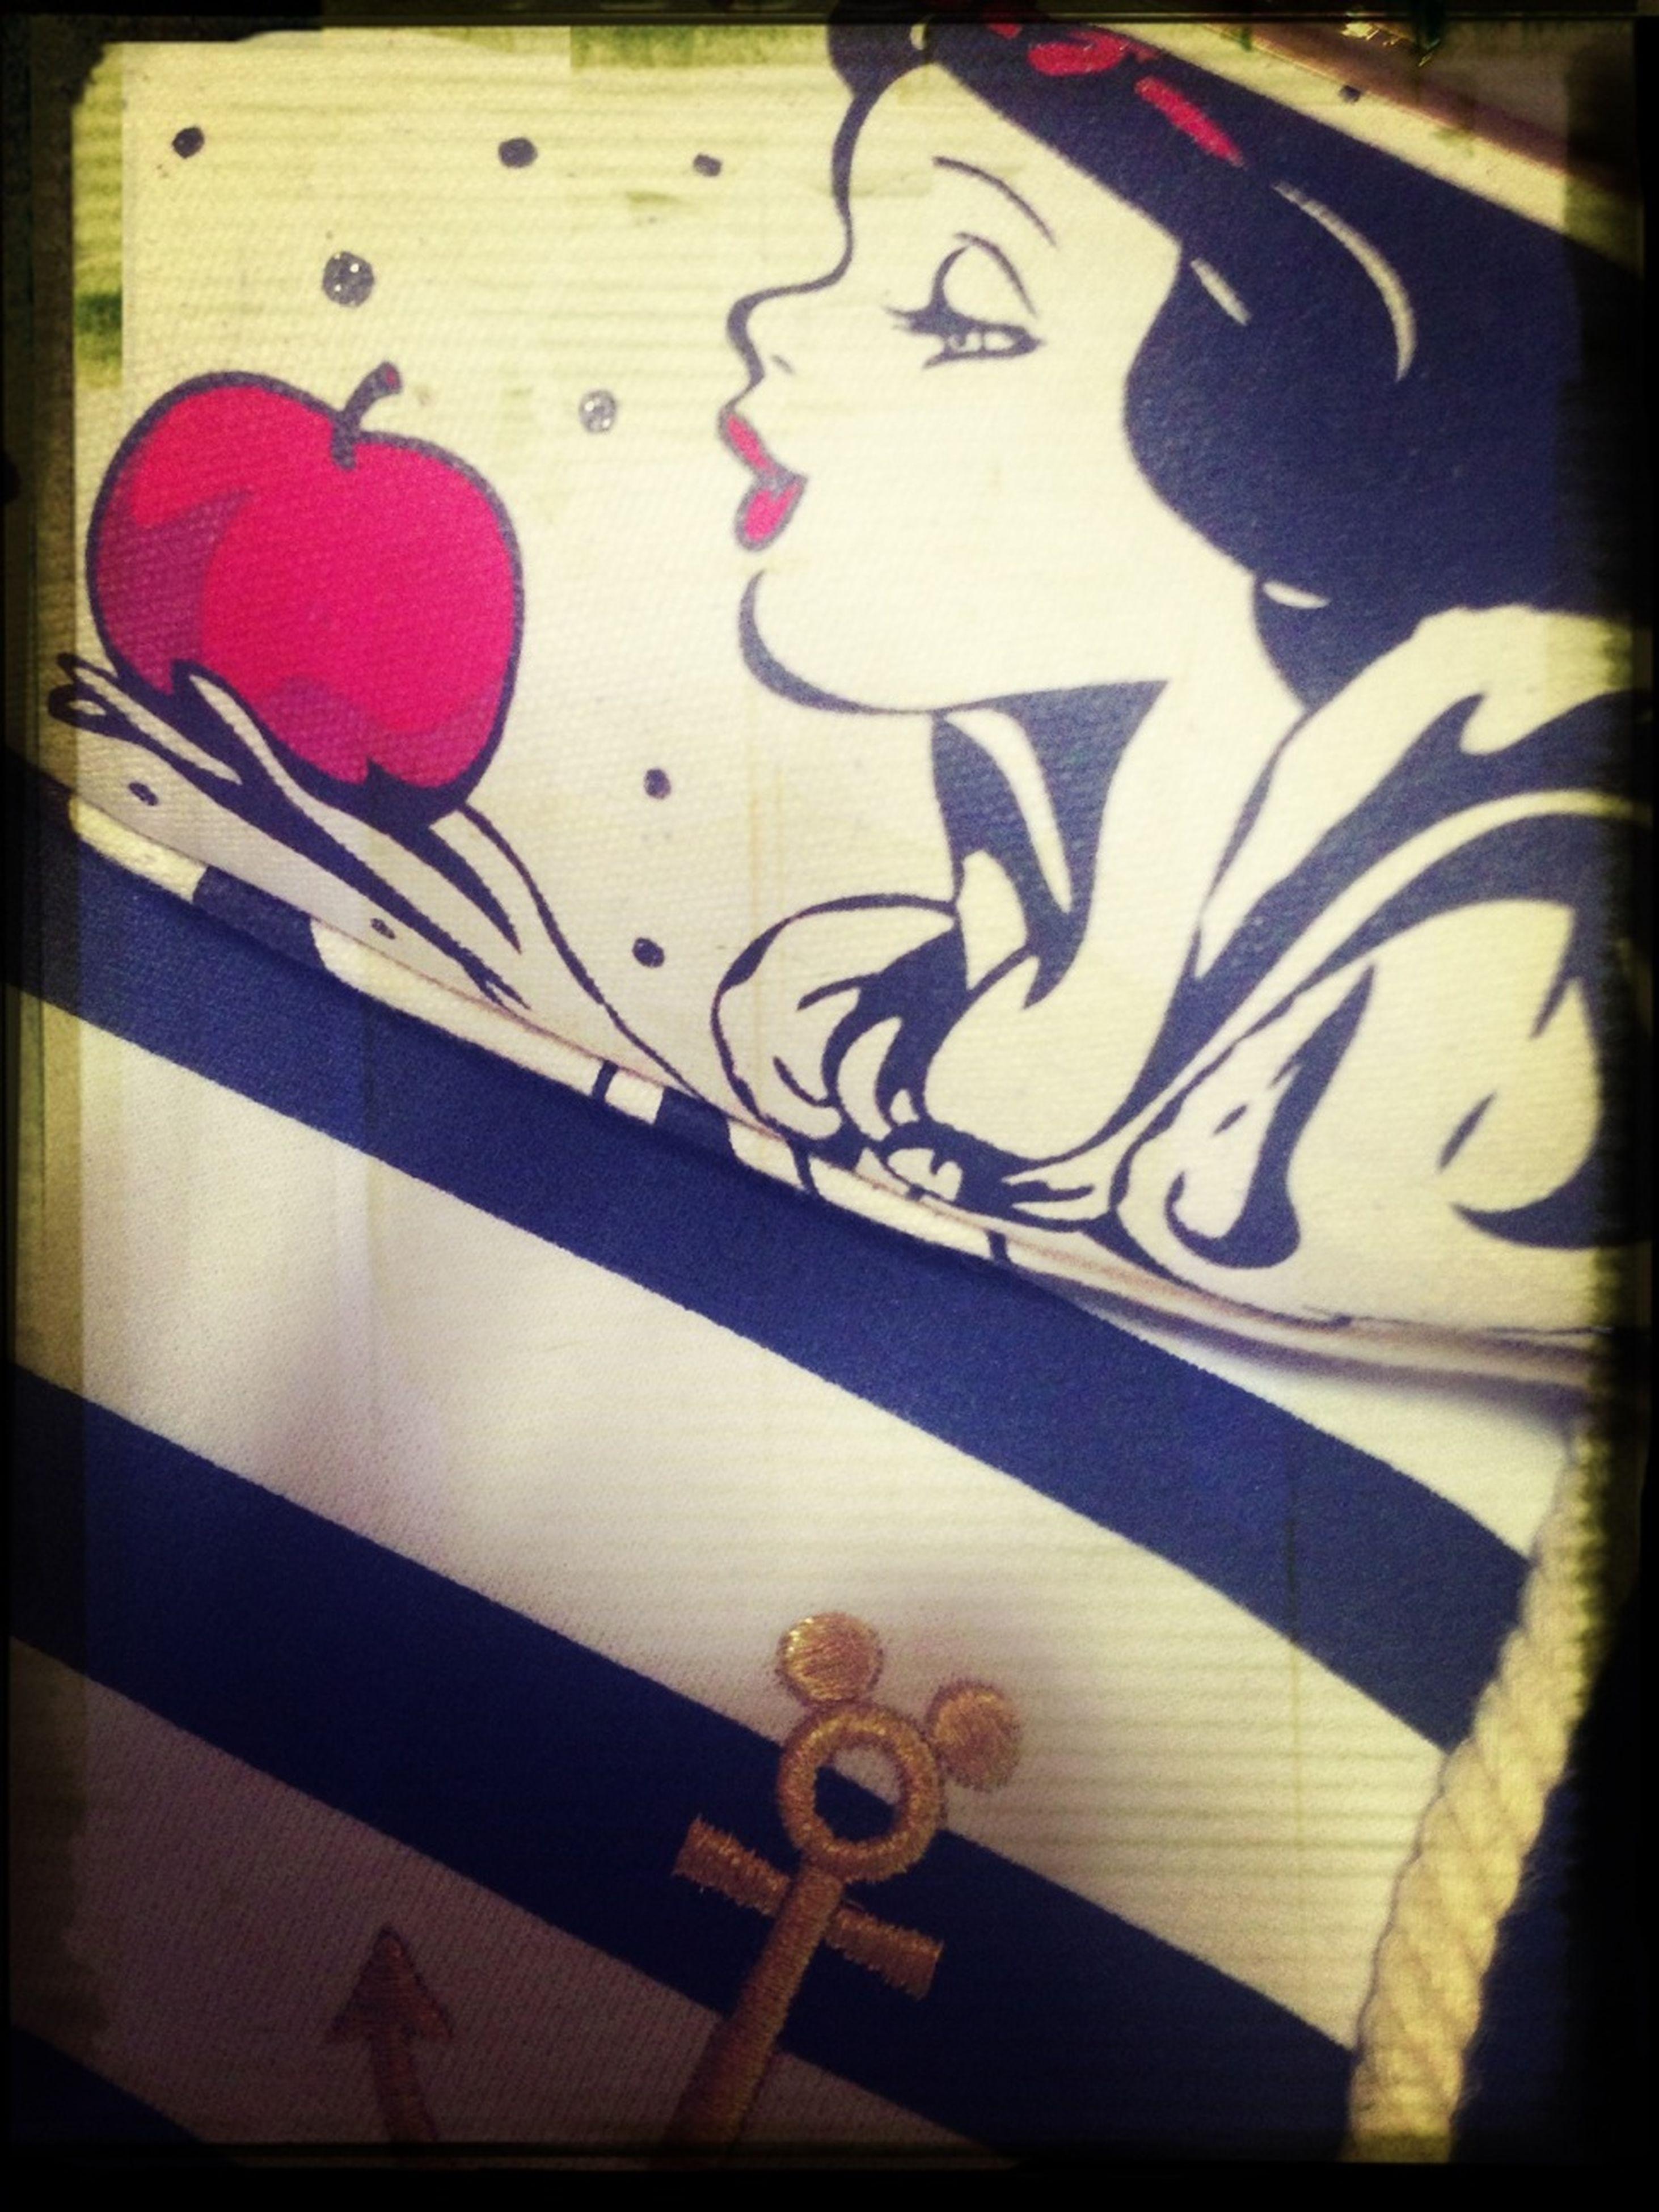 transfer print, art, art and craft, creativity, indoors, auto post production filter, human representation, graffiti, high angle view, animal representation, design, multi colored, shadow, close-up, pattern, text, street art